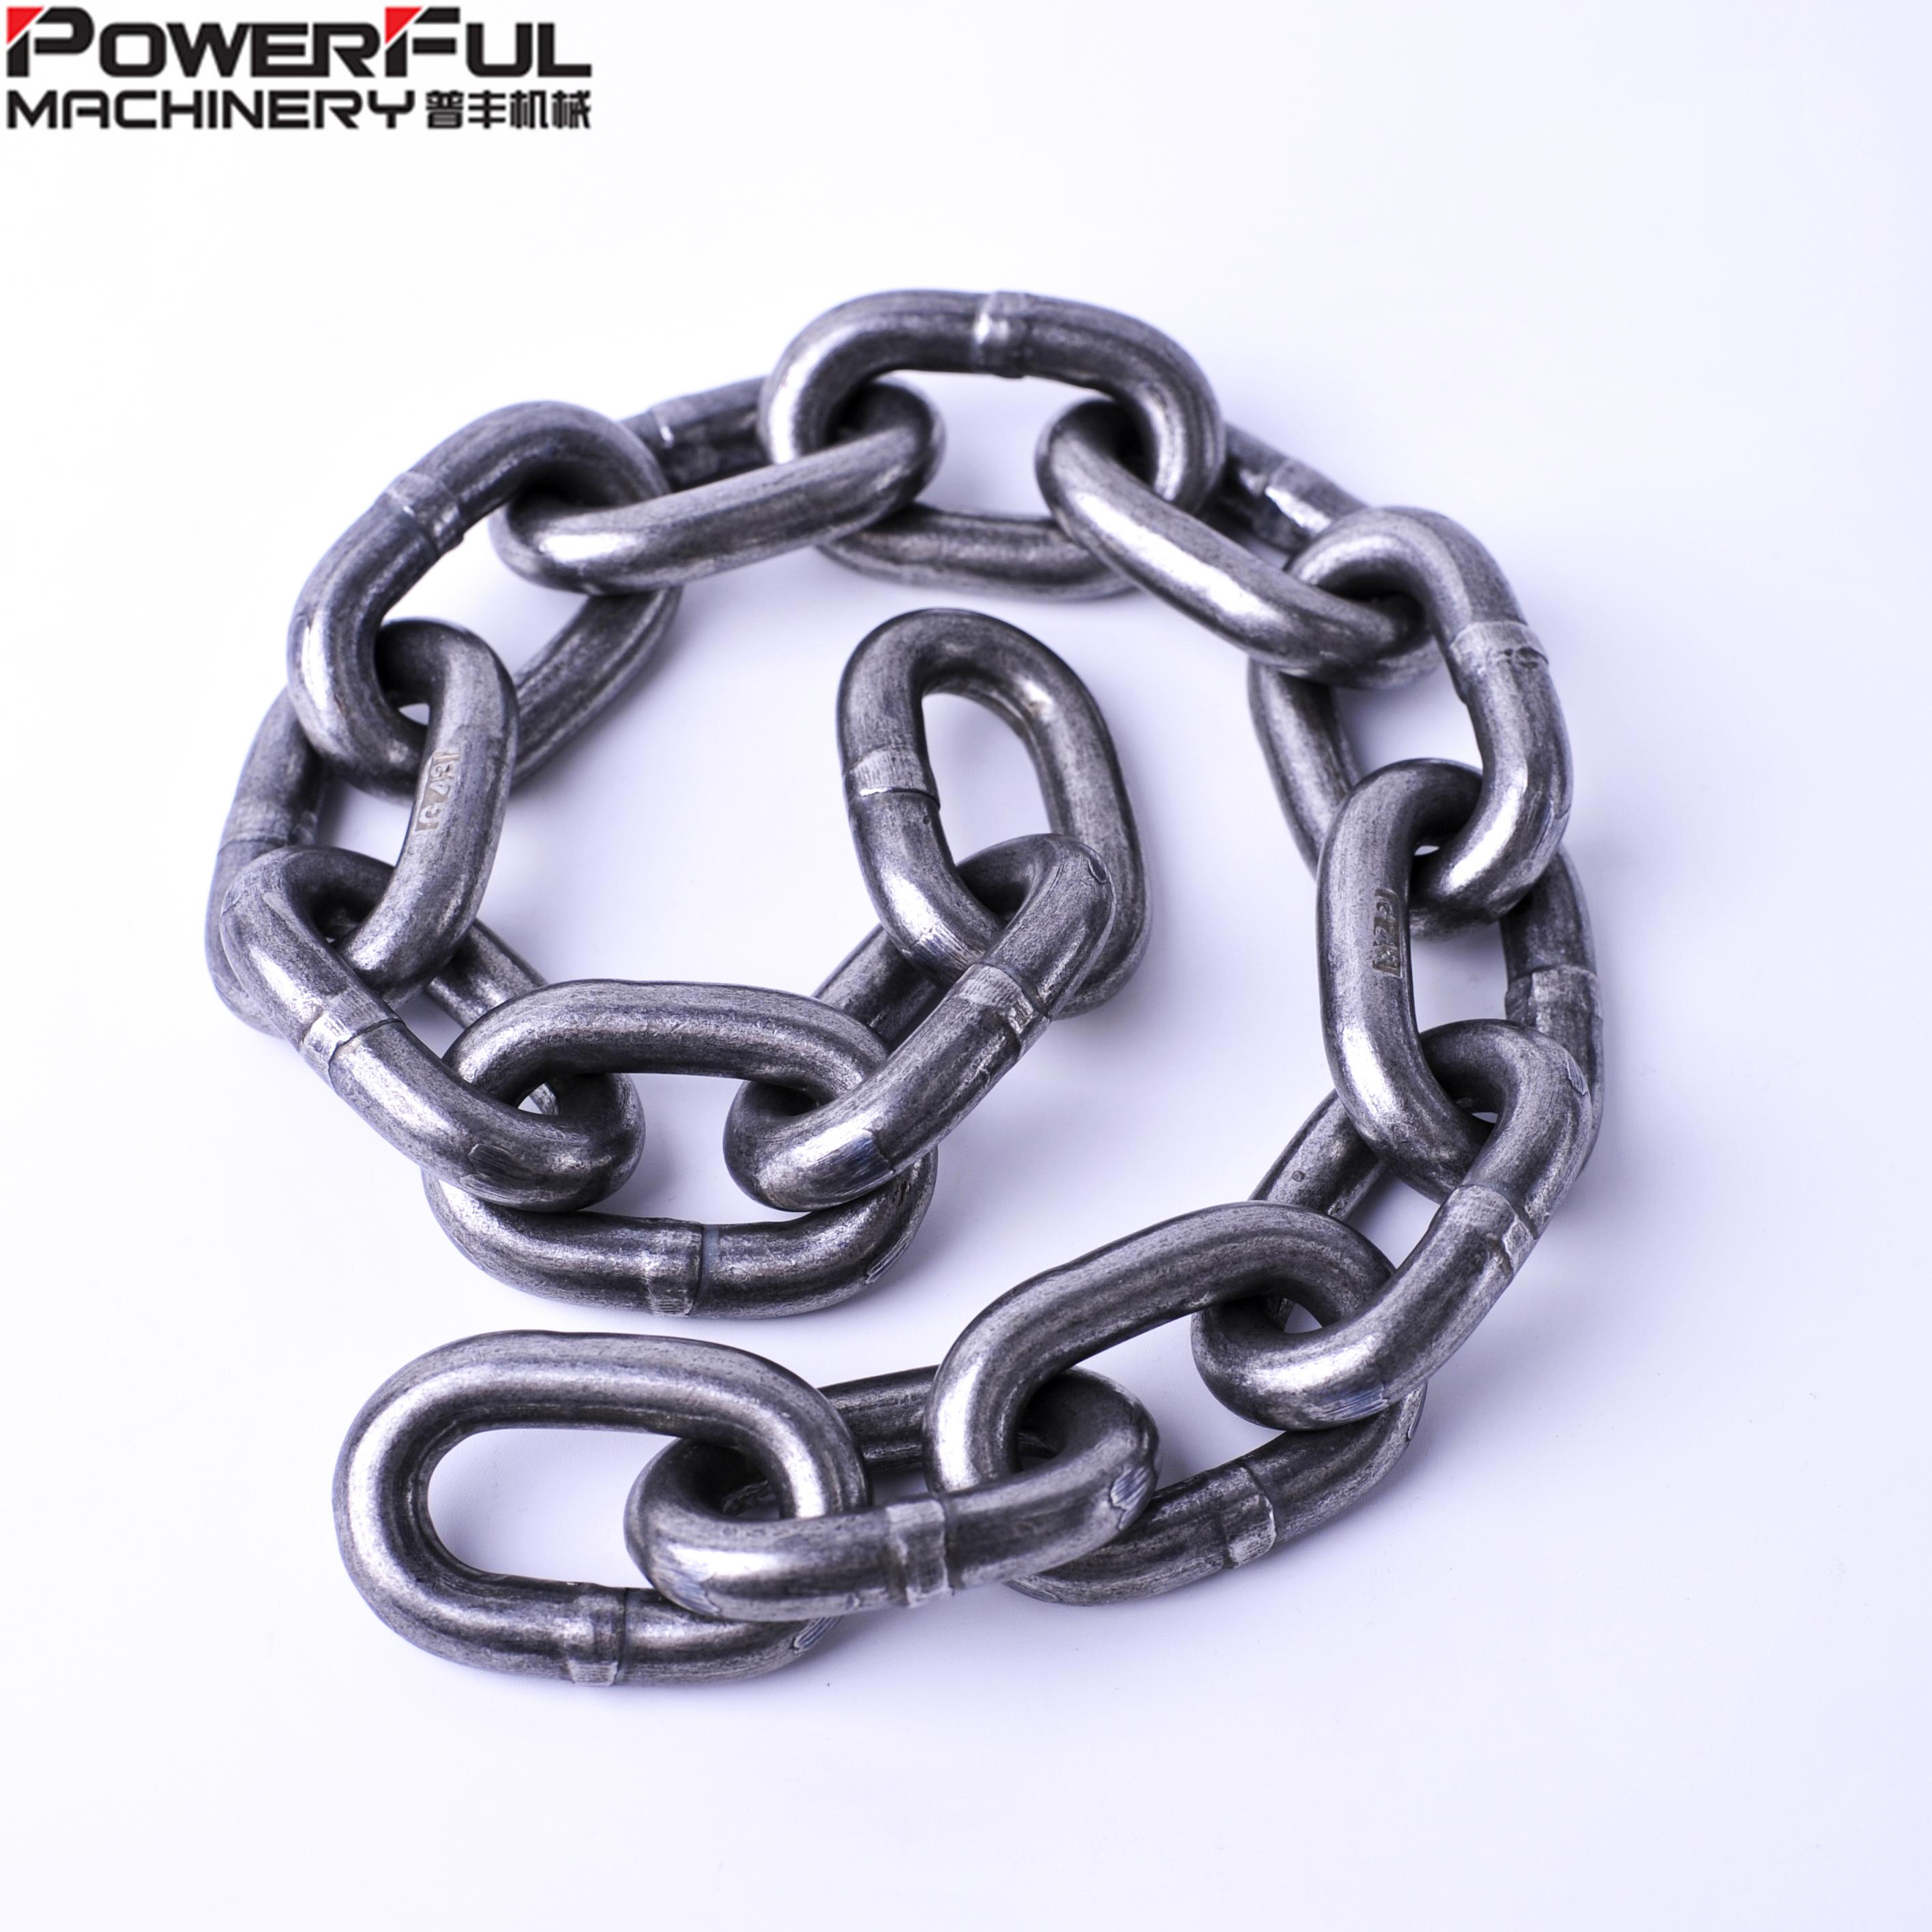 Strong Hot Dipped Galvanized Heavy Duty Steel Chain 4MM 2 Metre Custom Cut Length